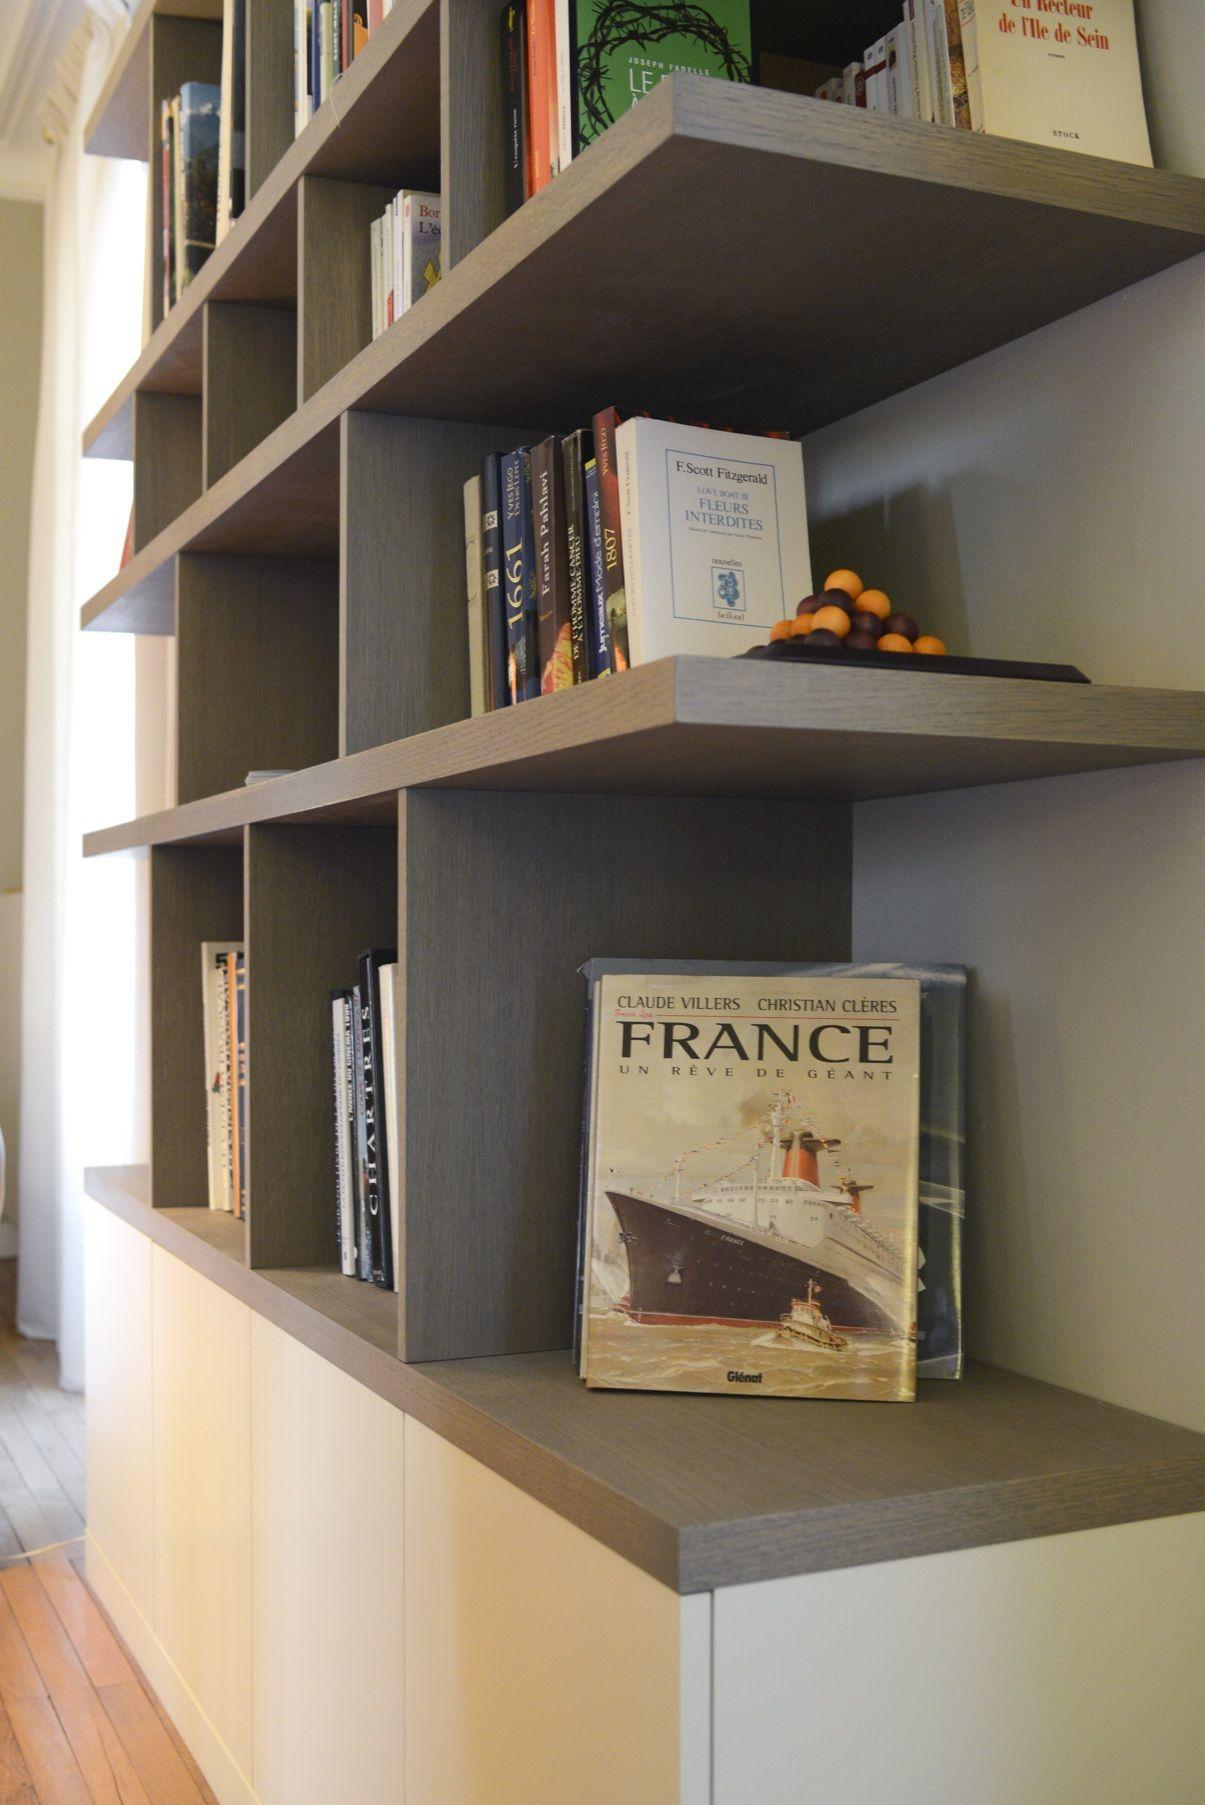 Bibliotheque Sur Mesure Paris Nantes Lorient Vannes La Compagnie Des Ateliers Bibliotheque Sur Mesure Idees Etageres Bibliotheque Design